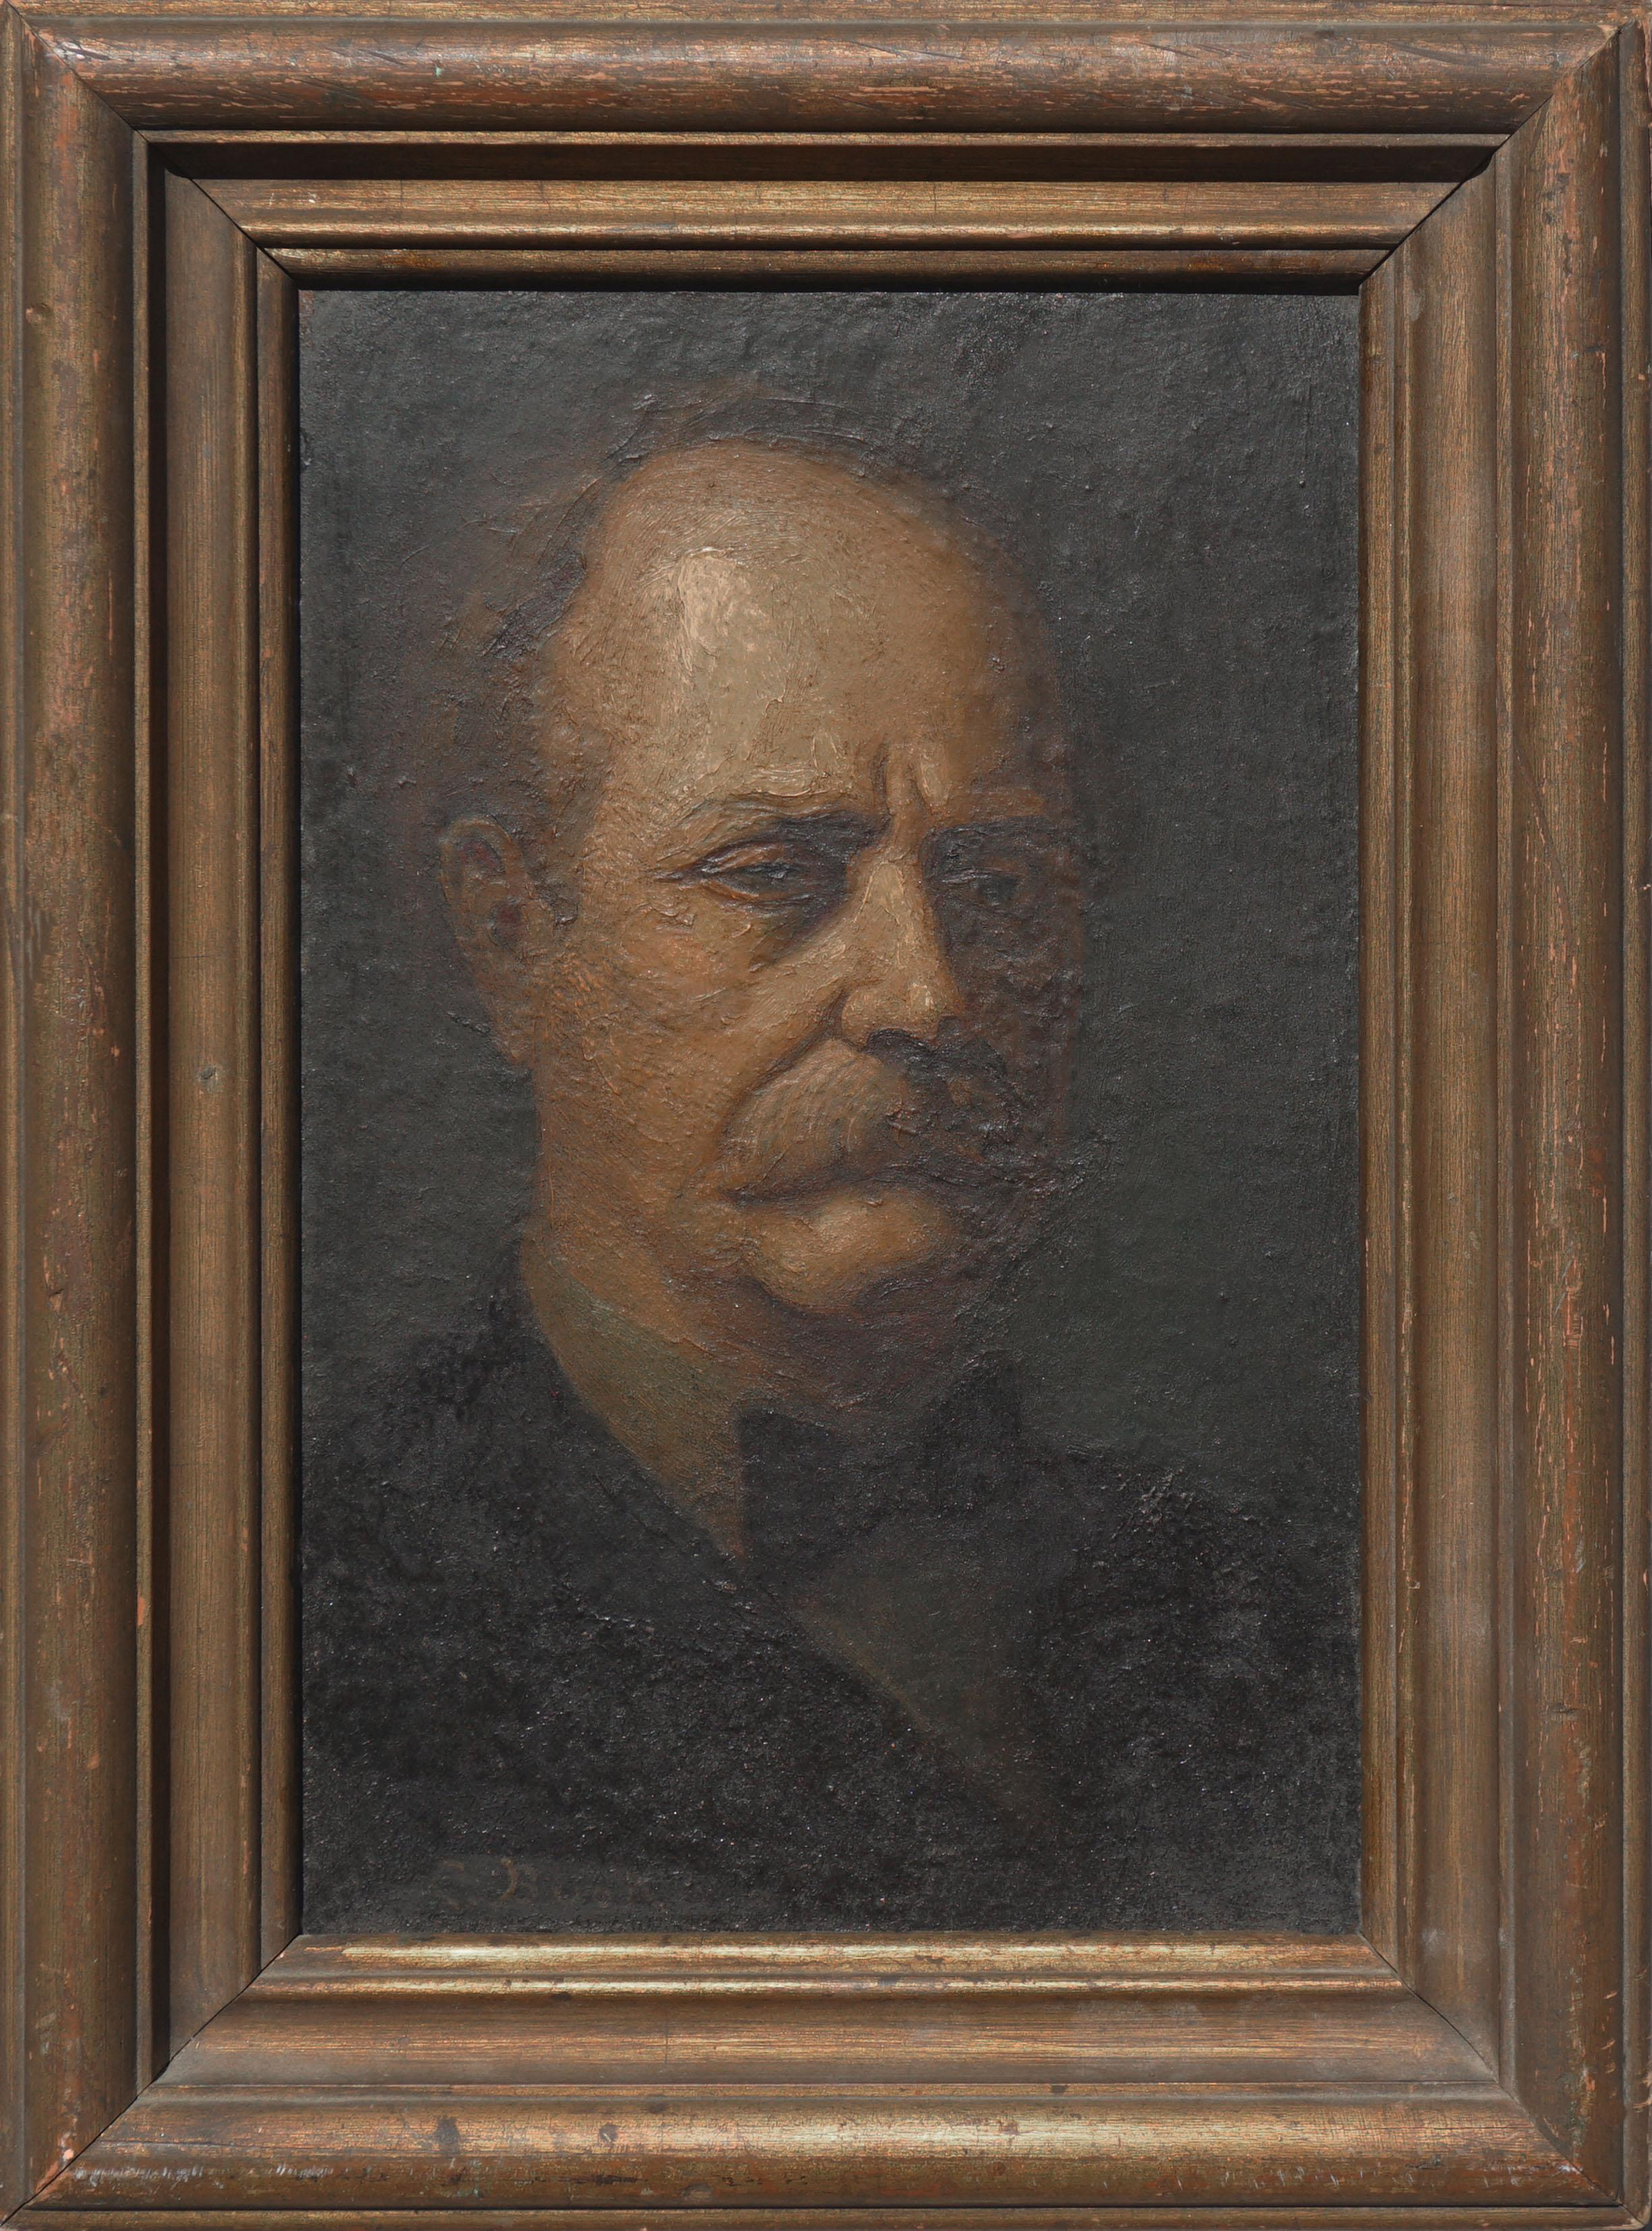 Portrait of Older Man by Claude Buck